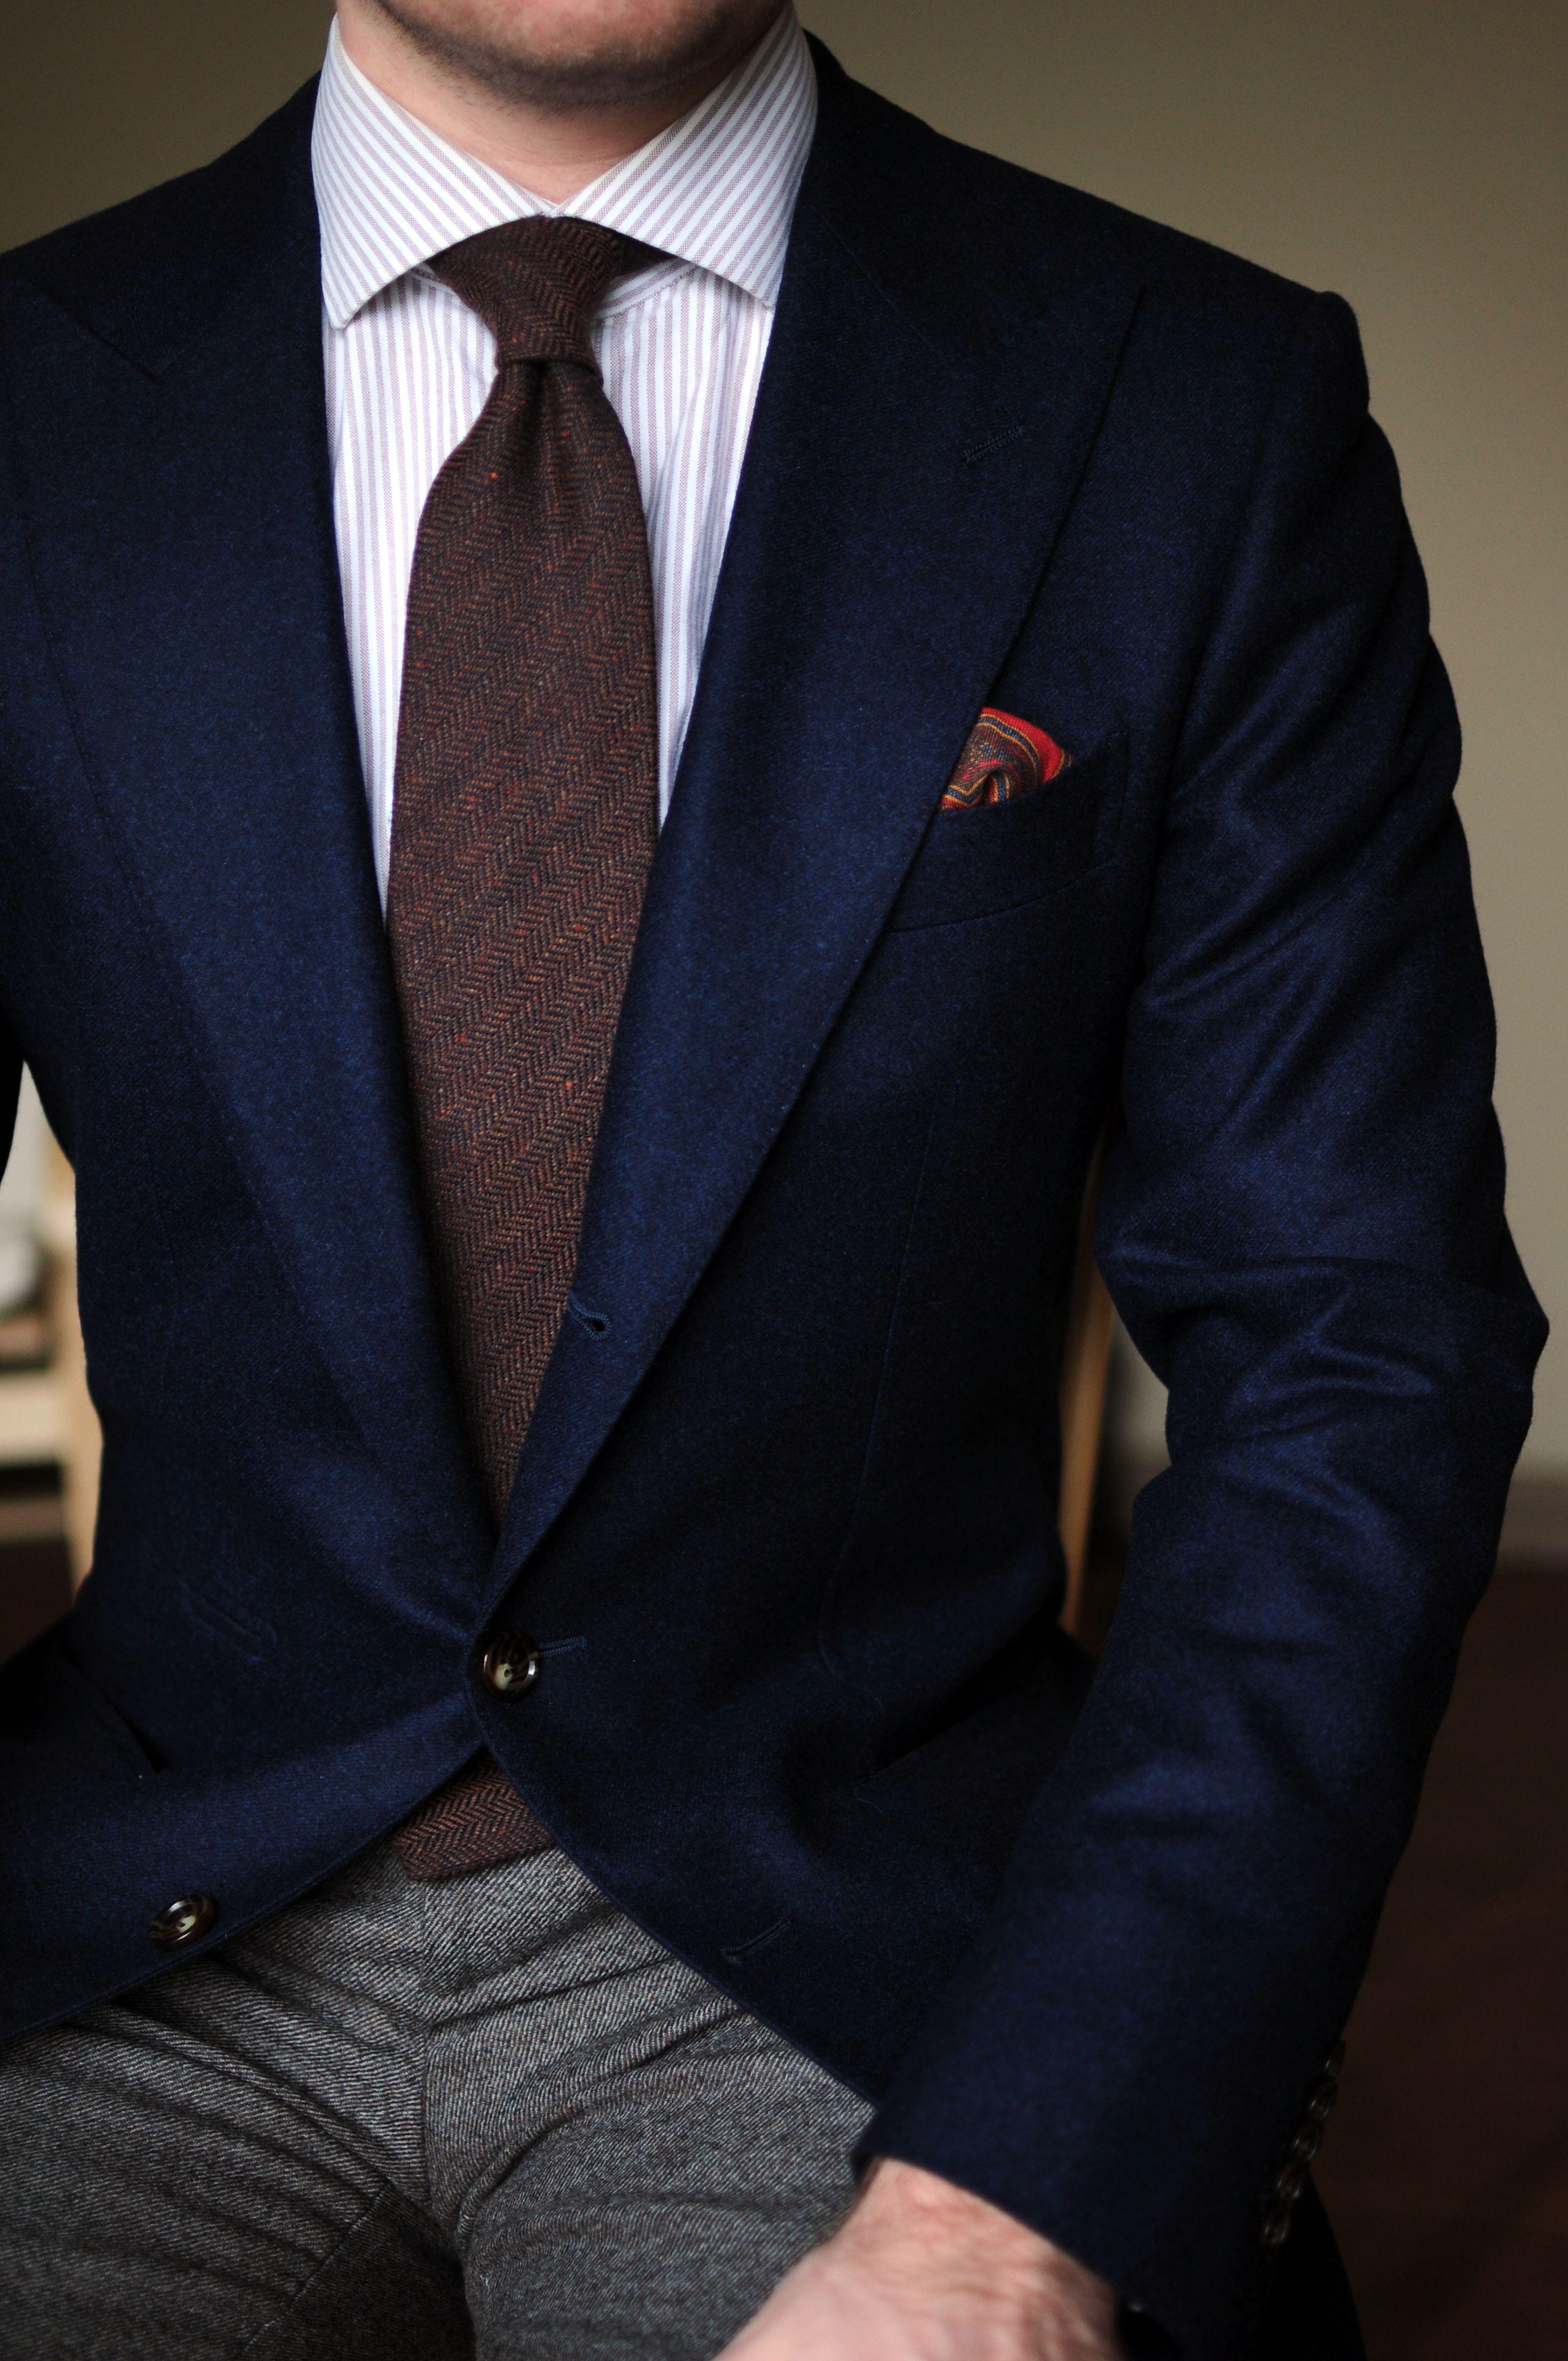 31 Blazer Outfits Men Ideas Mens Outfits Mens Fashion Suit Fashion